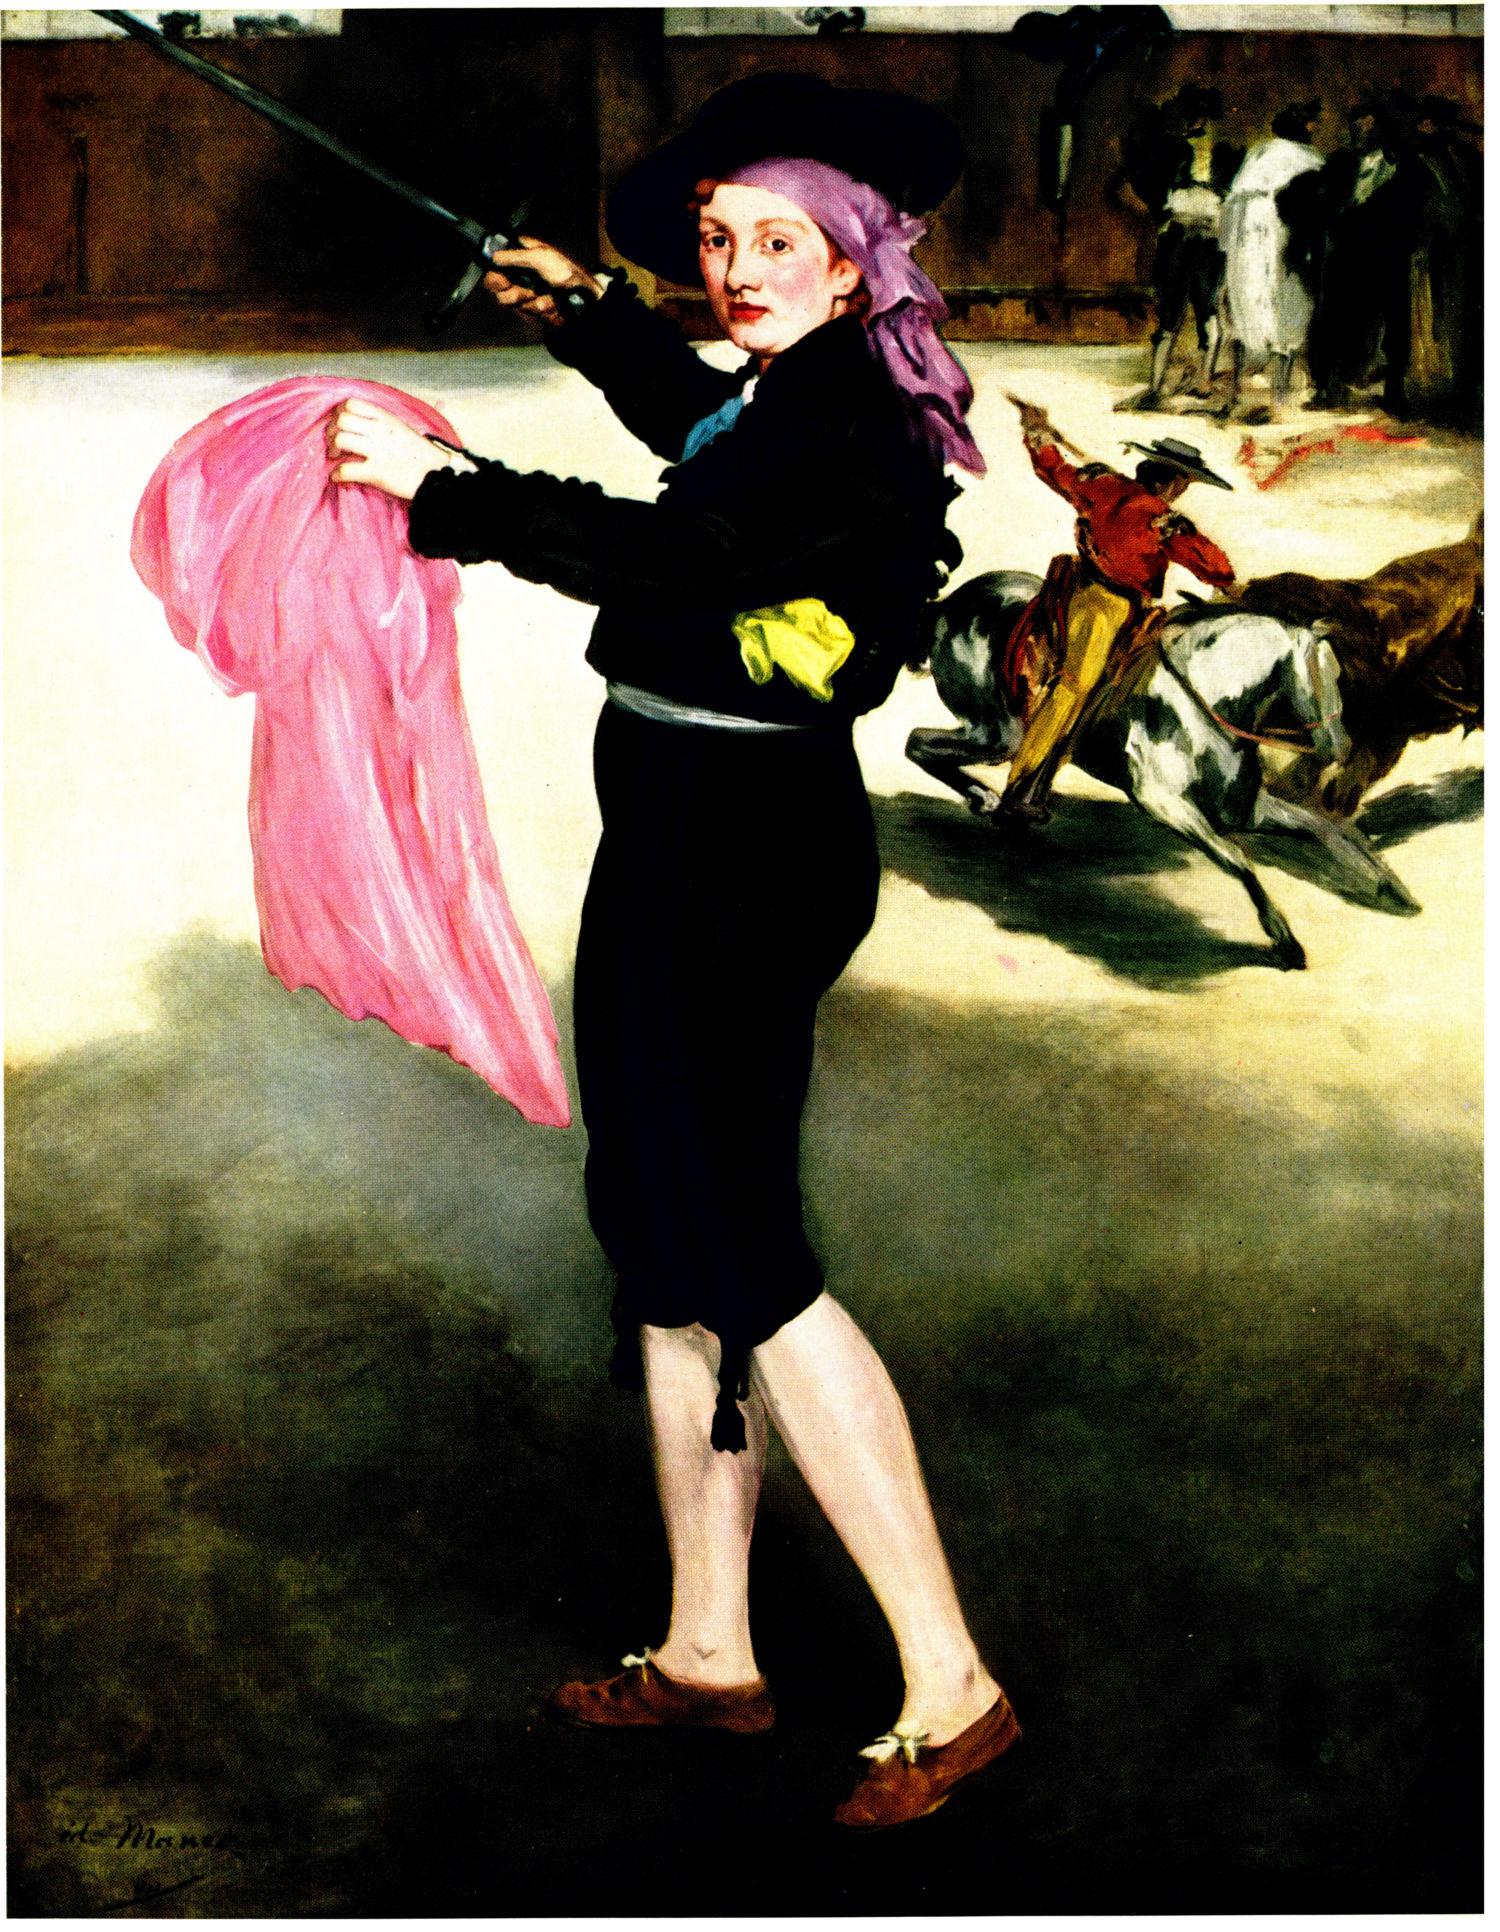 E. Manet (Édouard Manet) Modemoiselle victorine in the costume of an espada, Metropoiten New York ©noten-apitz.de; Bildquelle: Metropolitan Museum New-York, et Editions Cercle d' Art 1961